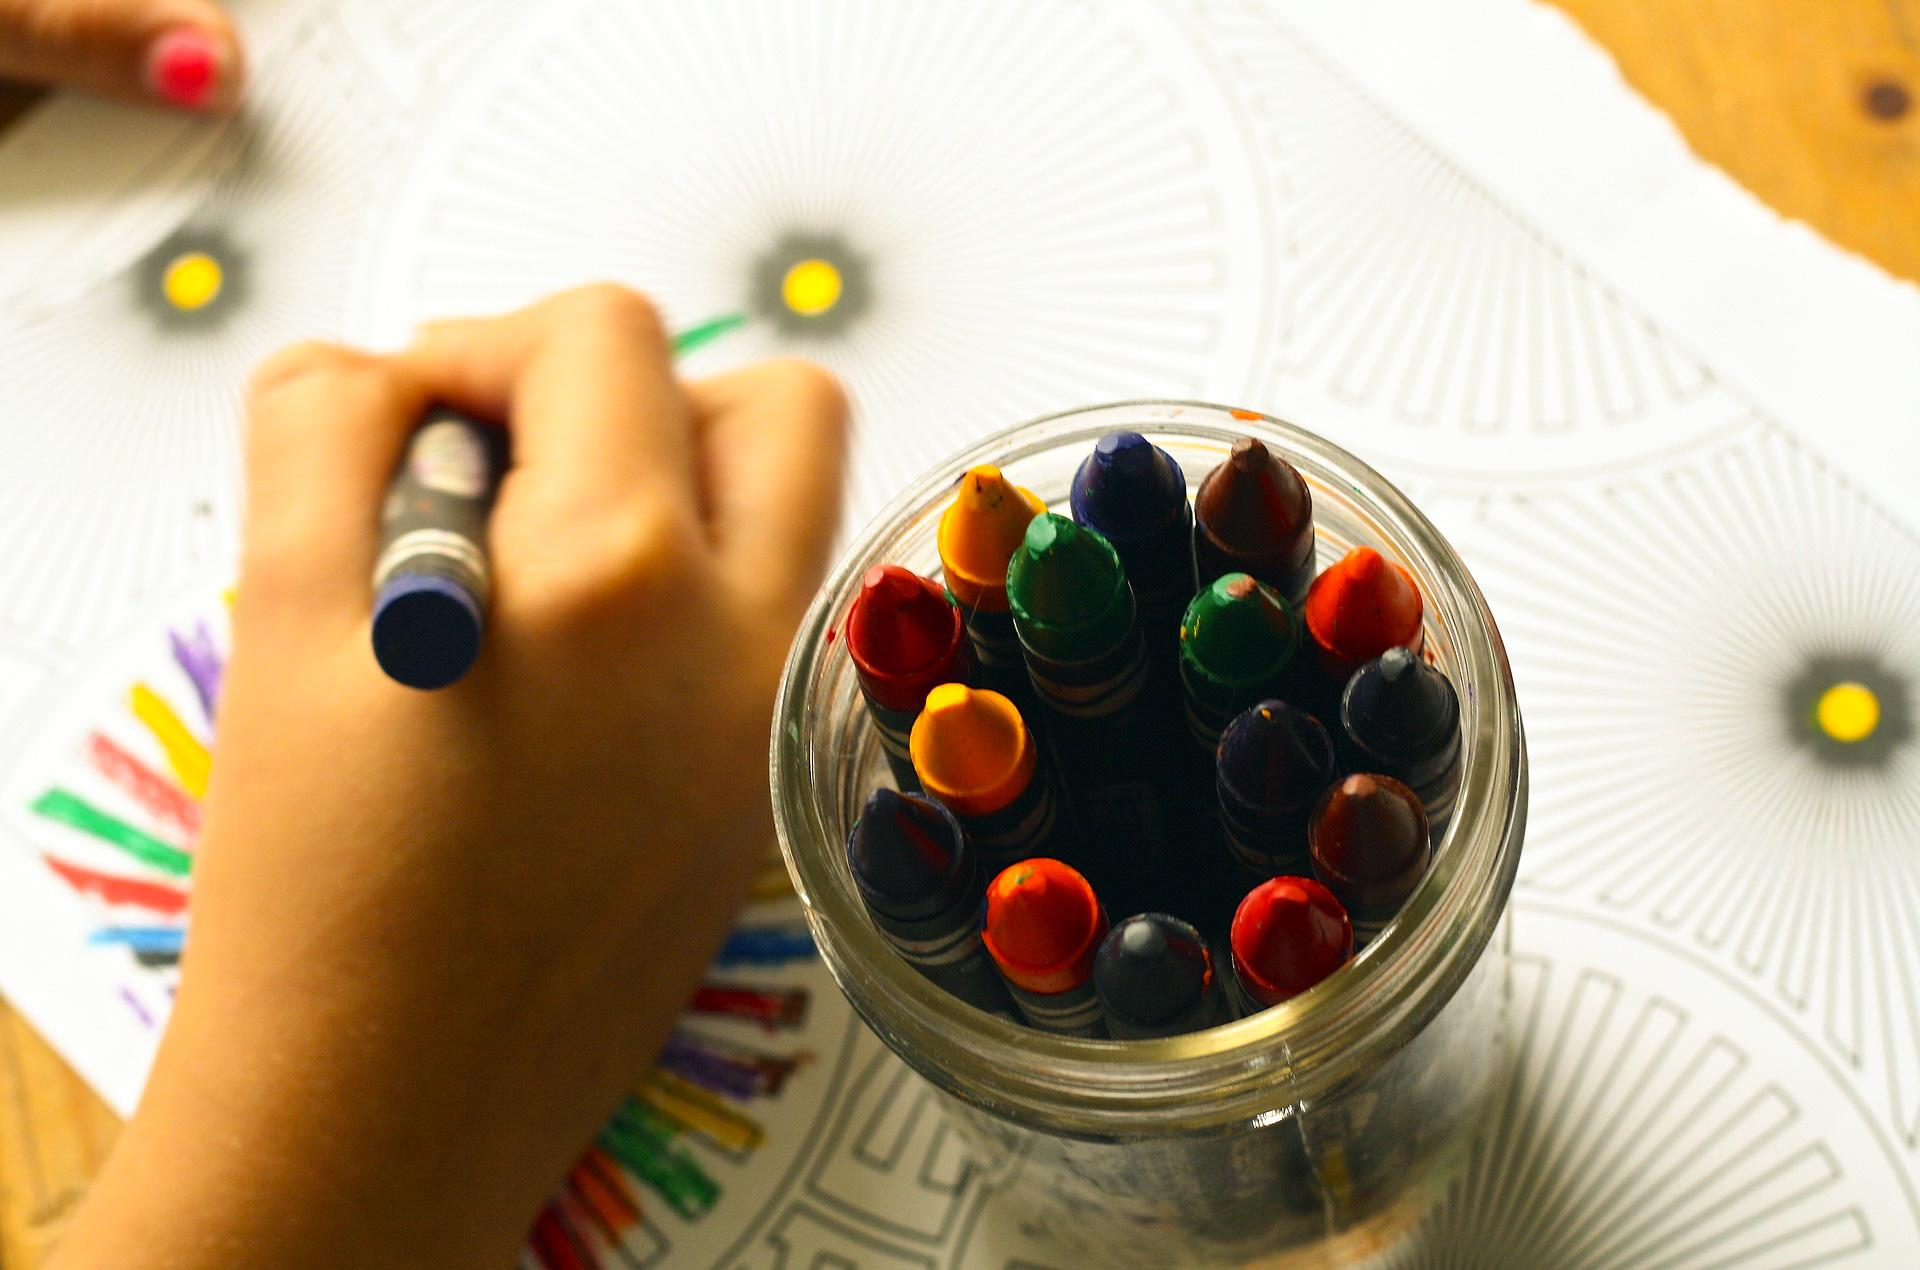 crayons-1445053_1920 (1)_edited.jpg